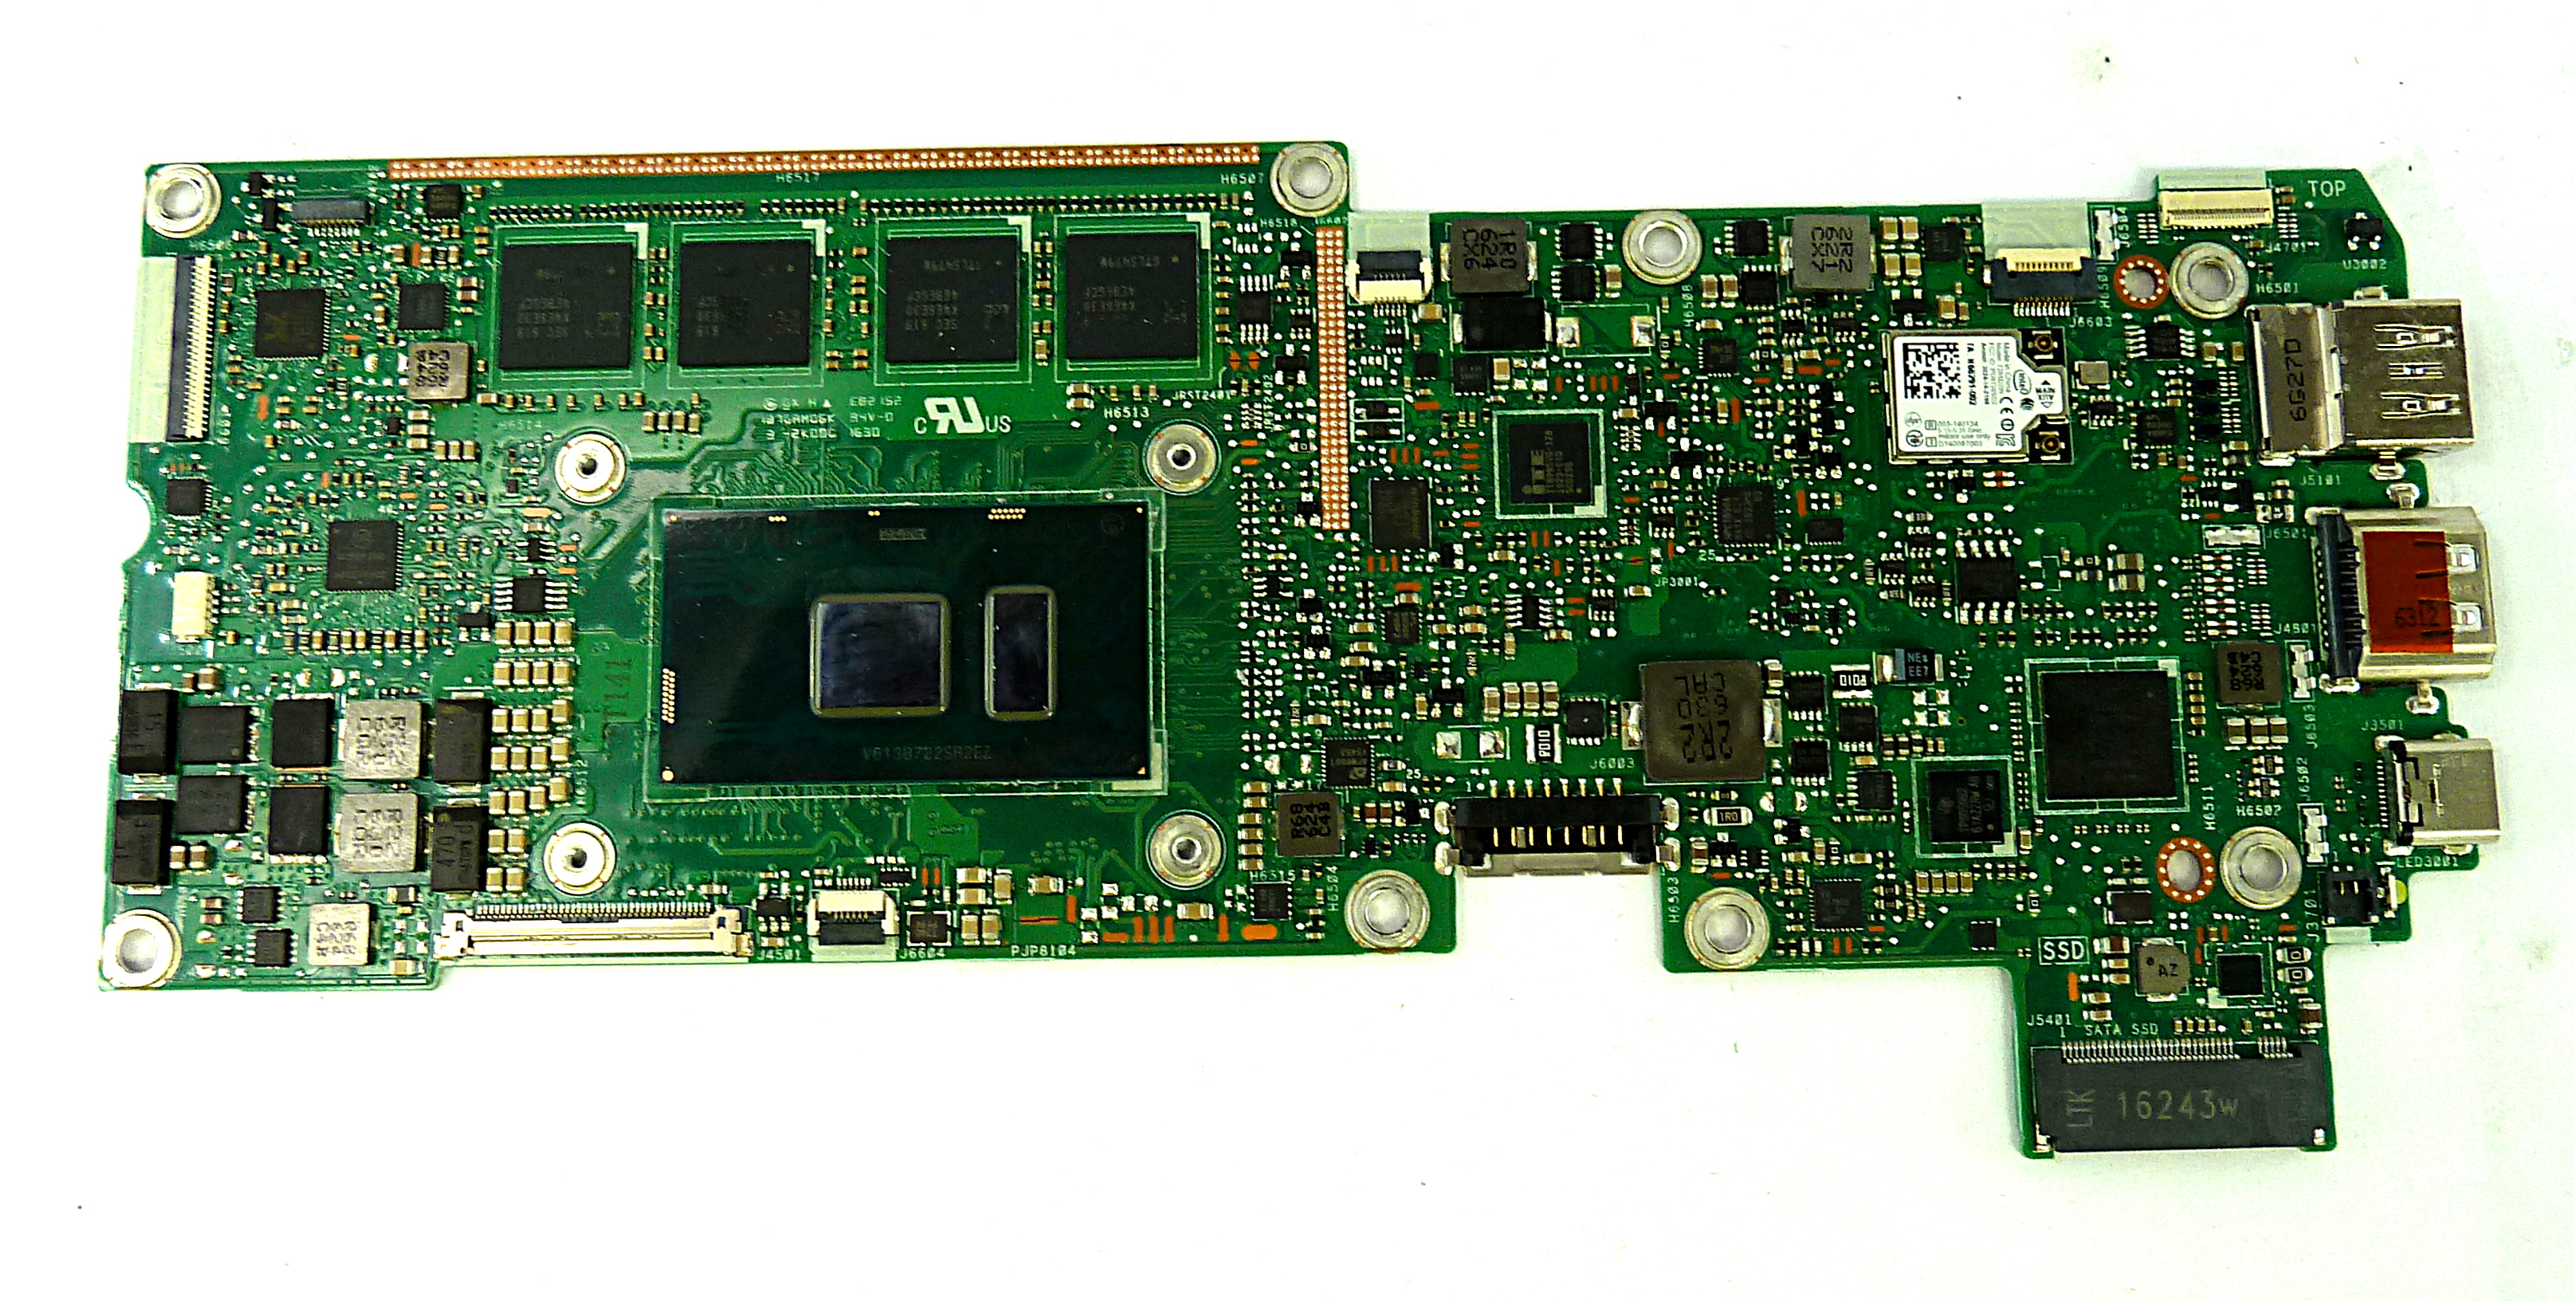 Asus Transformer Book 3 - T303UA  i7-6500U/8GB RAM Main Board- 60NB0C60-MB5140